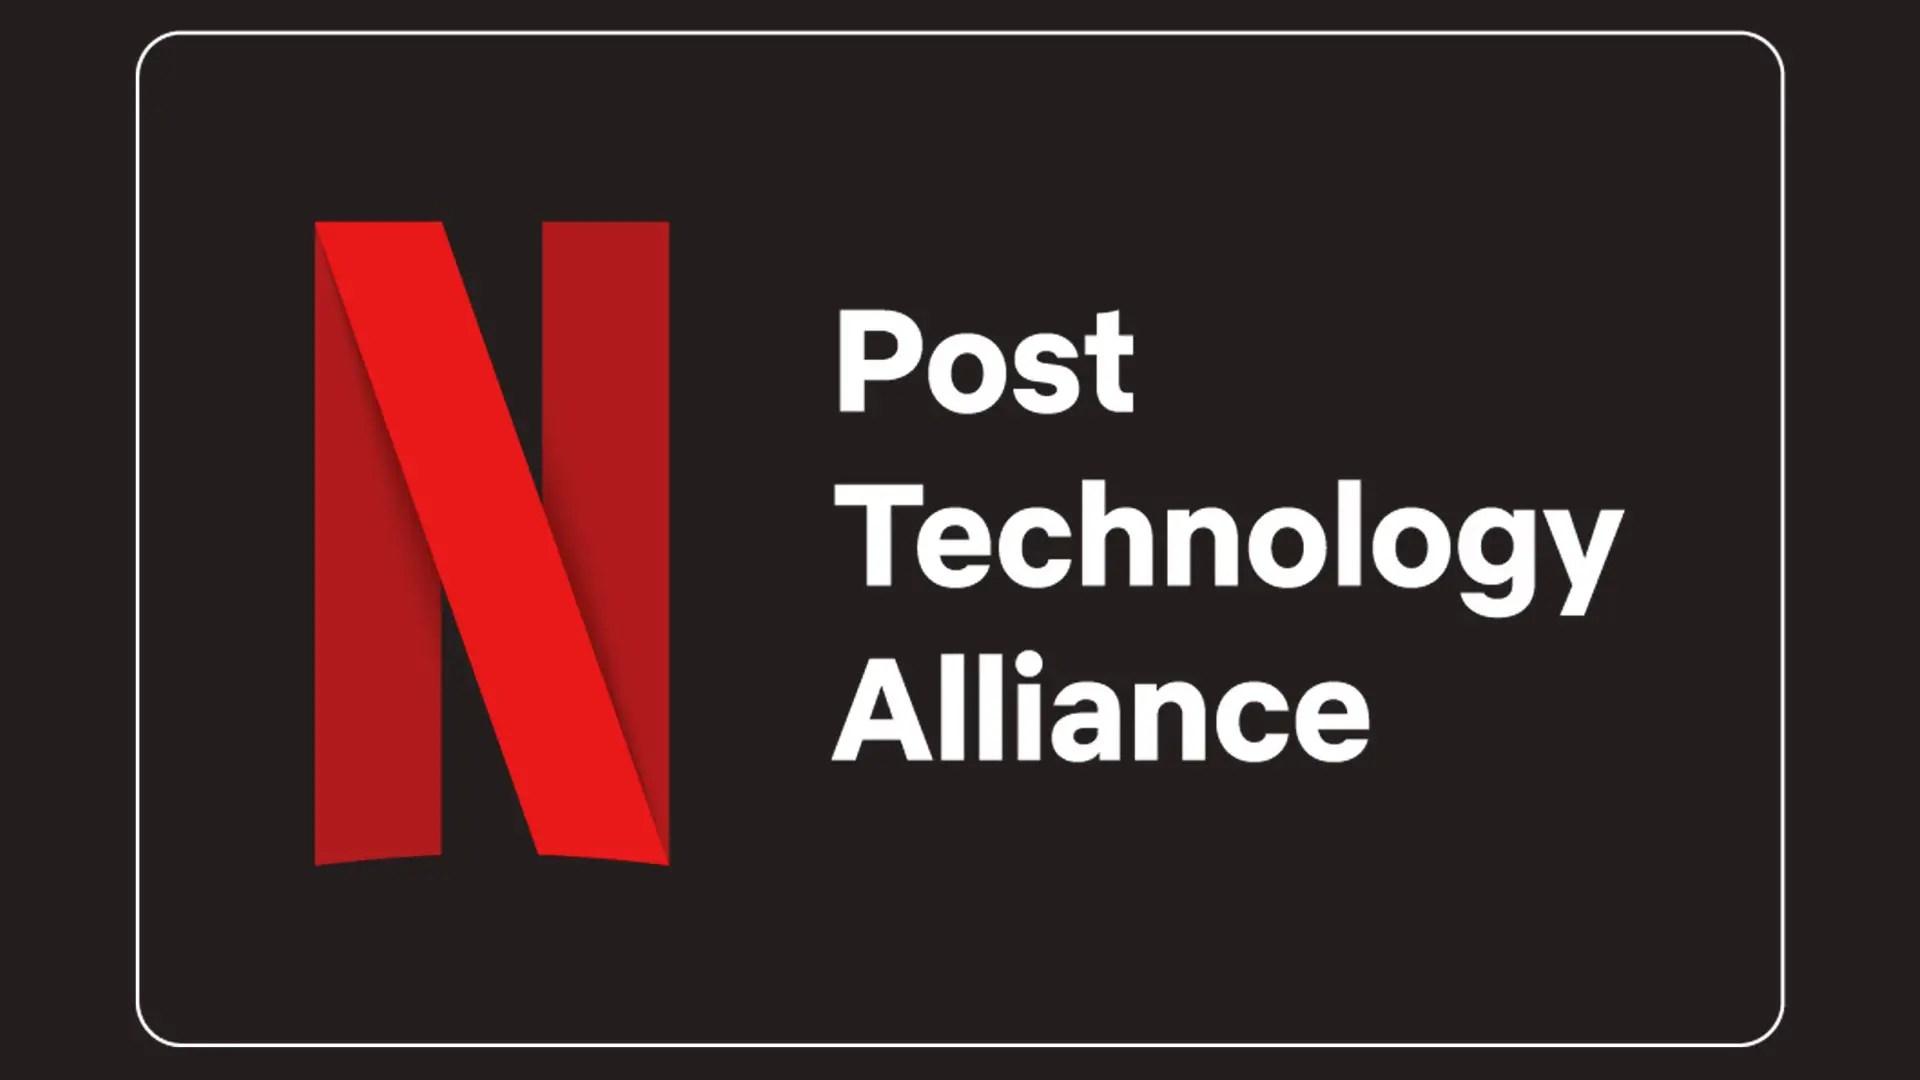 DaVinci Resolve Studio 15 Became a Netflix Post Technology Alliance